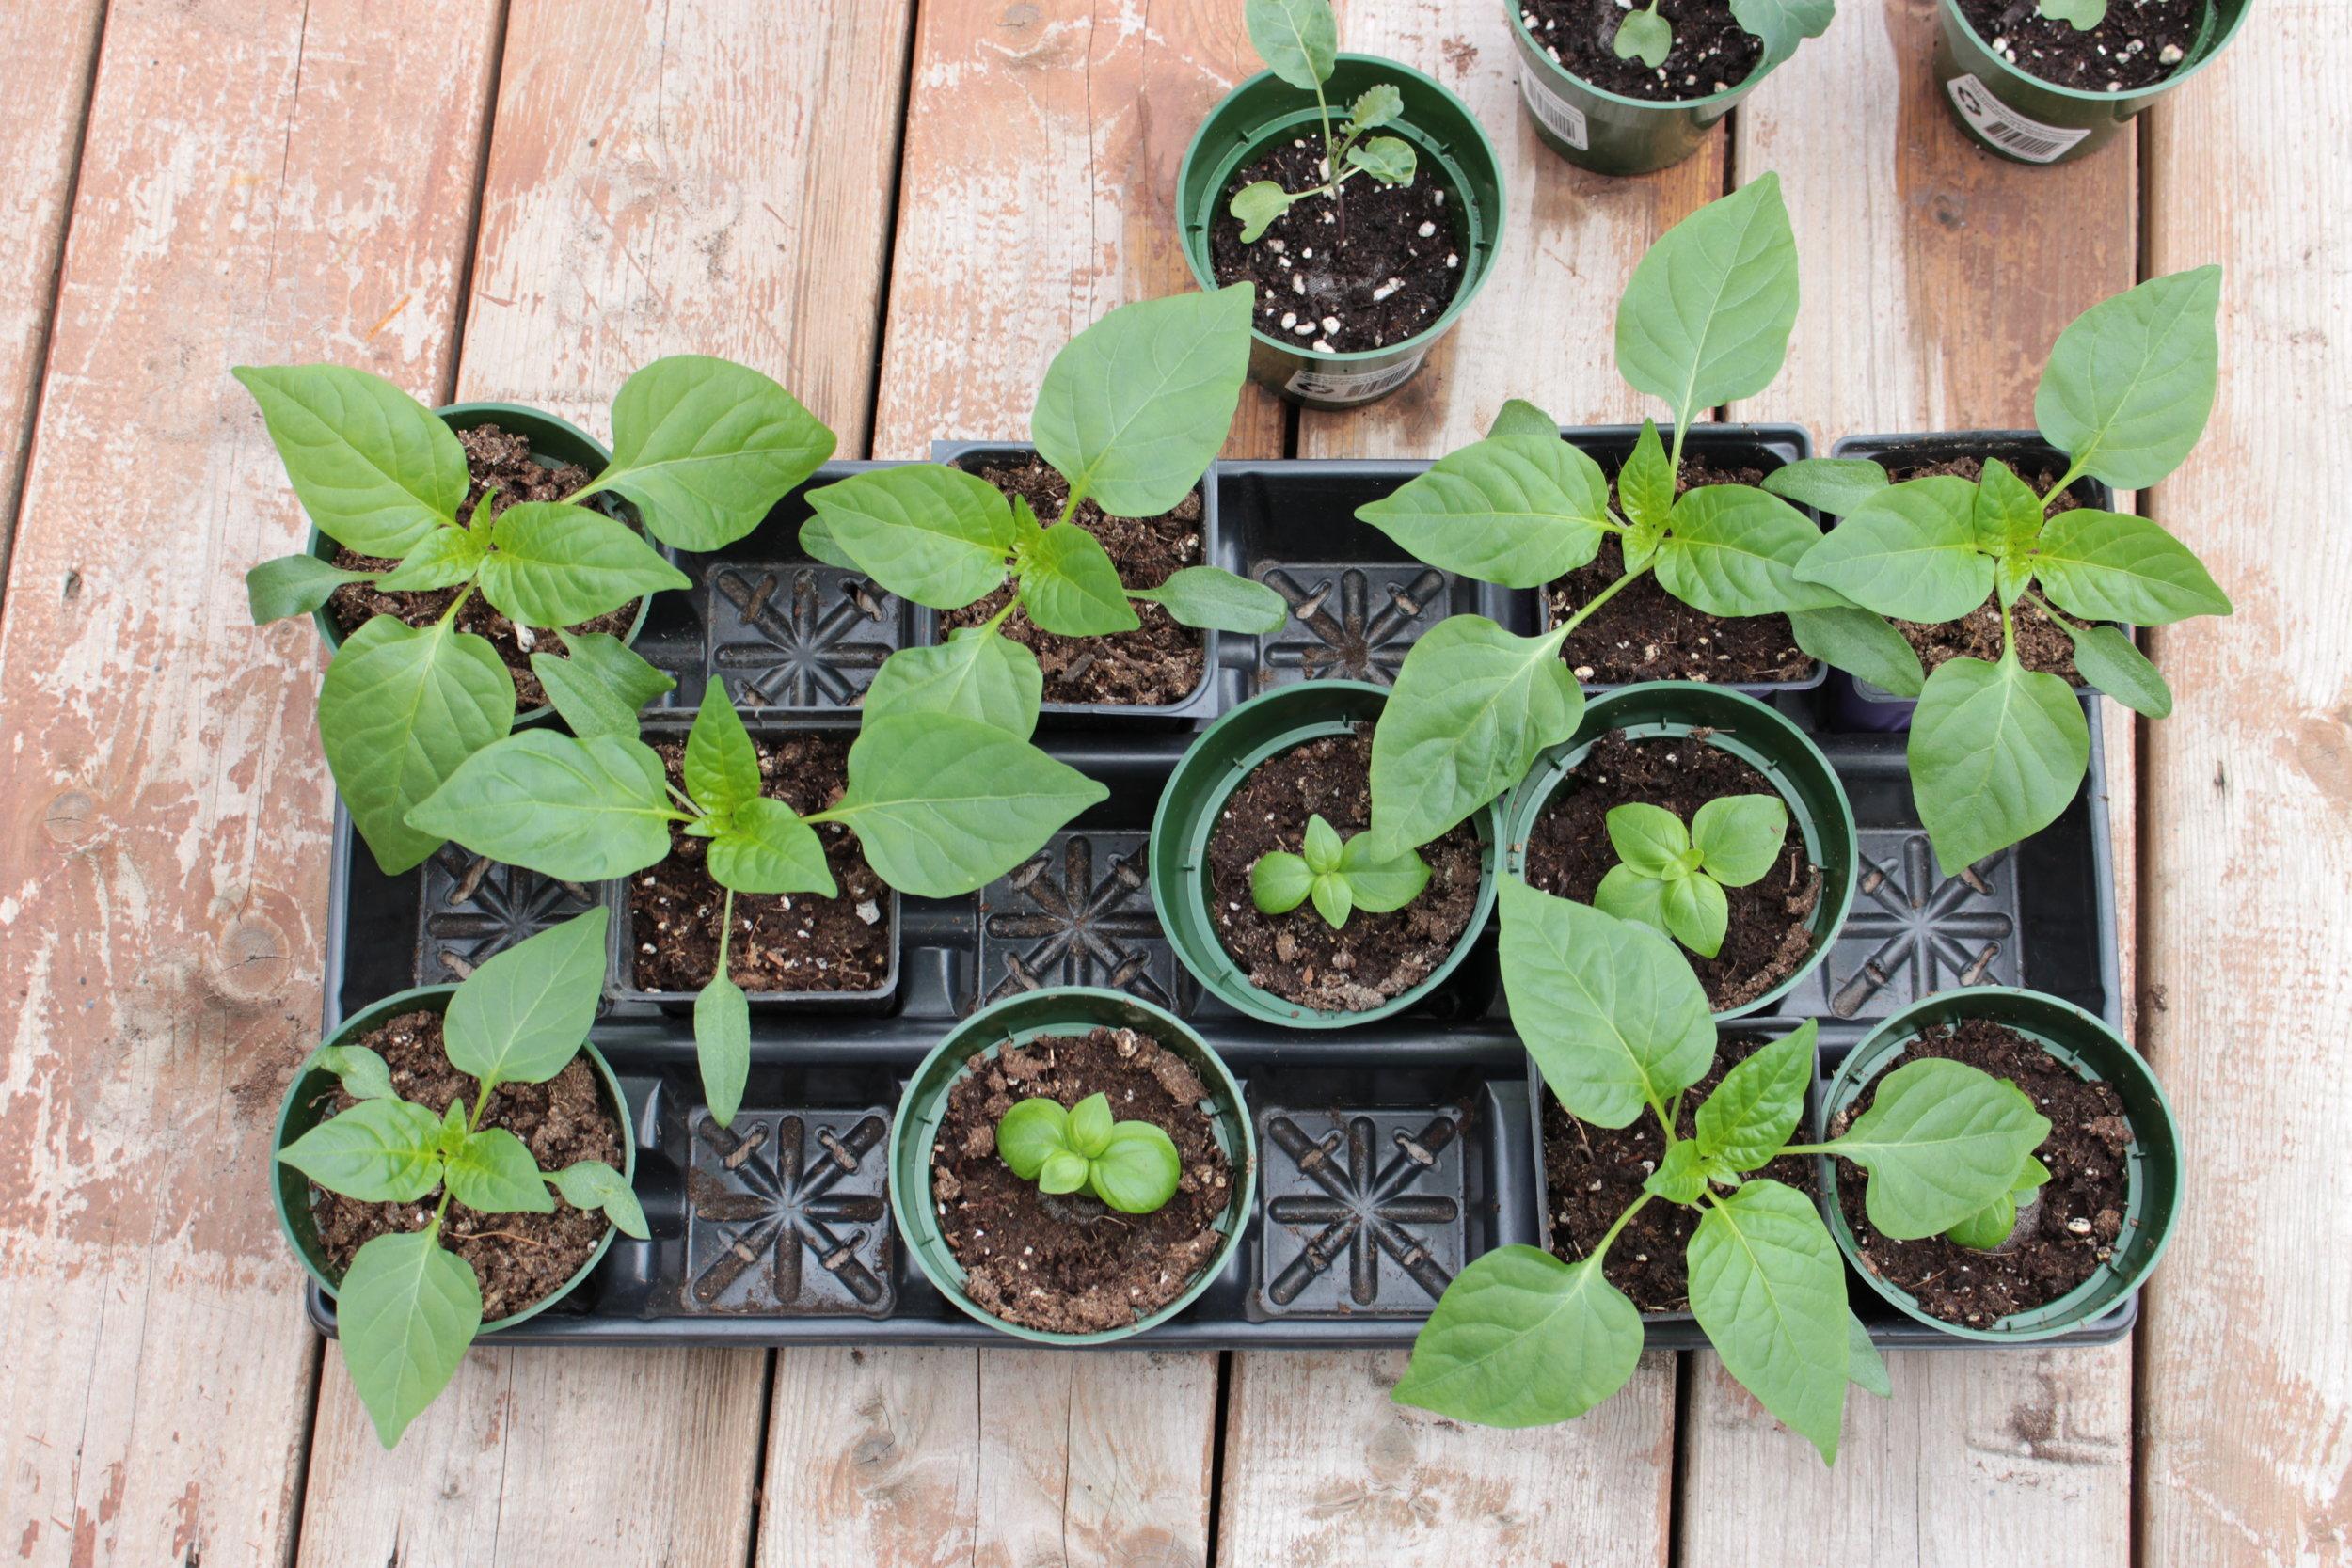 Quelques uns de mes semis